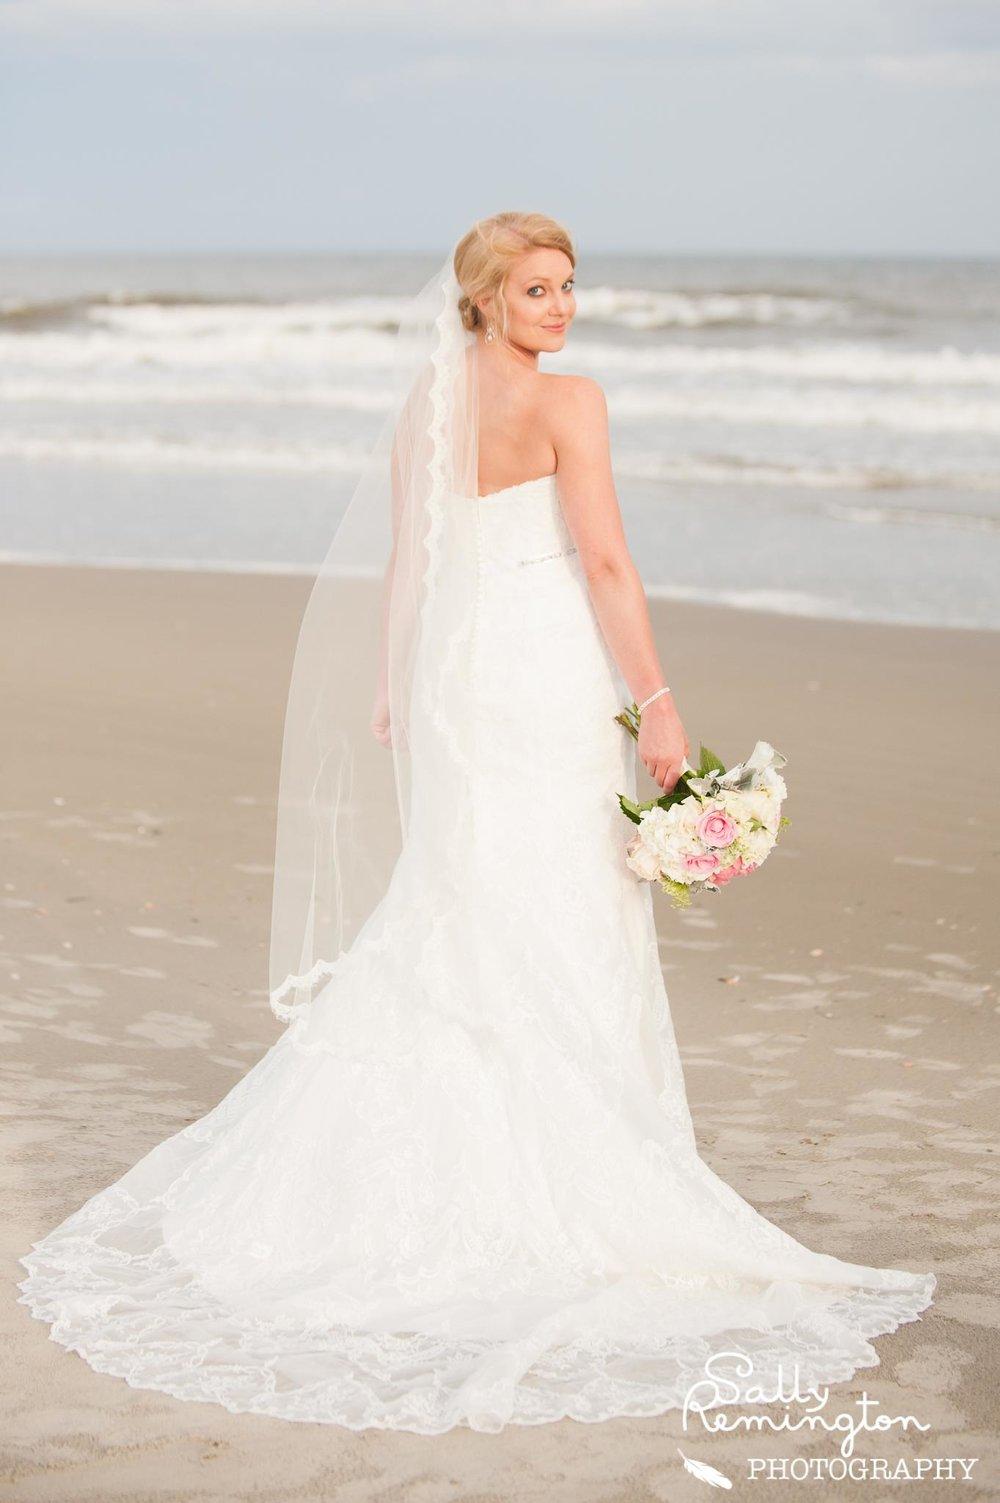 ivory-and-beau-bridal-boutique-savannah-wedding-dress-savannah-wedding-gown-kirstie-maggie-sottero-real-maggie-sottero-bride-beach-wedding-sarah-remington-photography-4.jpg